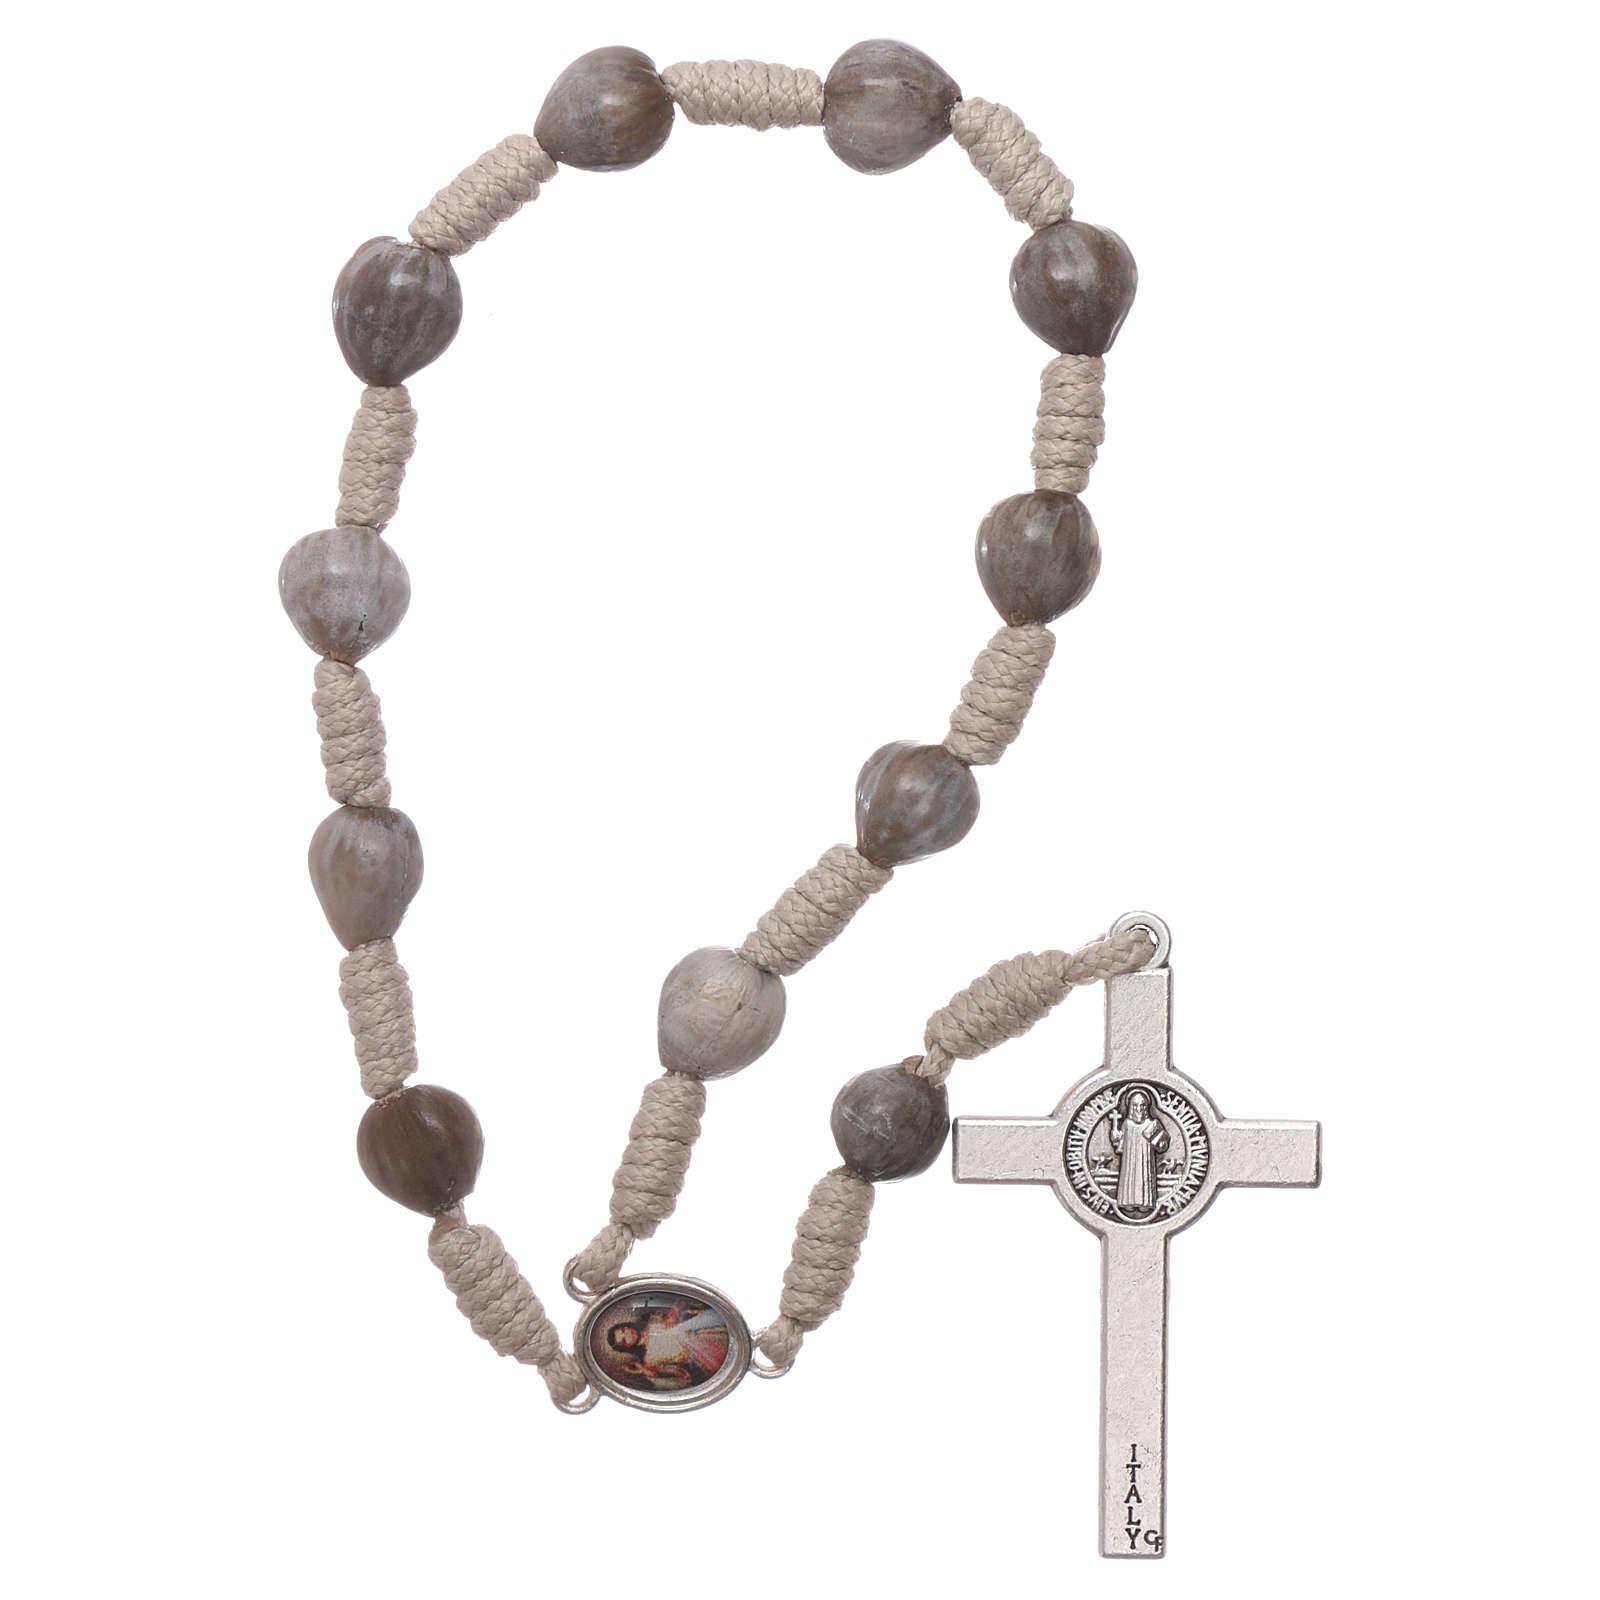 Medjugorje single decade rosary tears of Job in beige rope 4